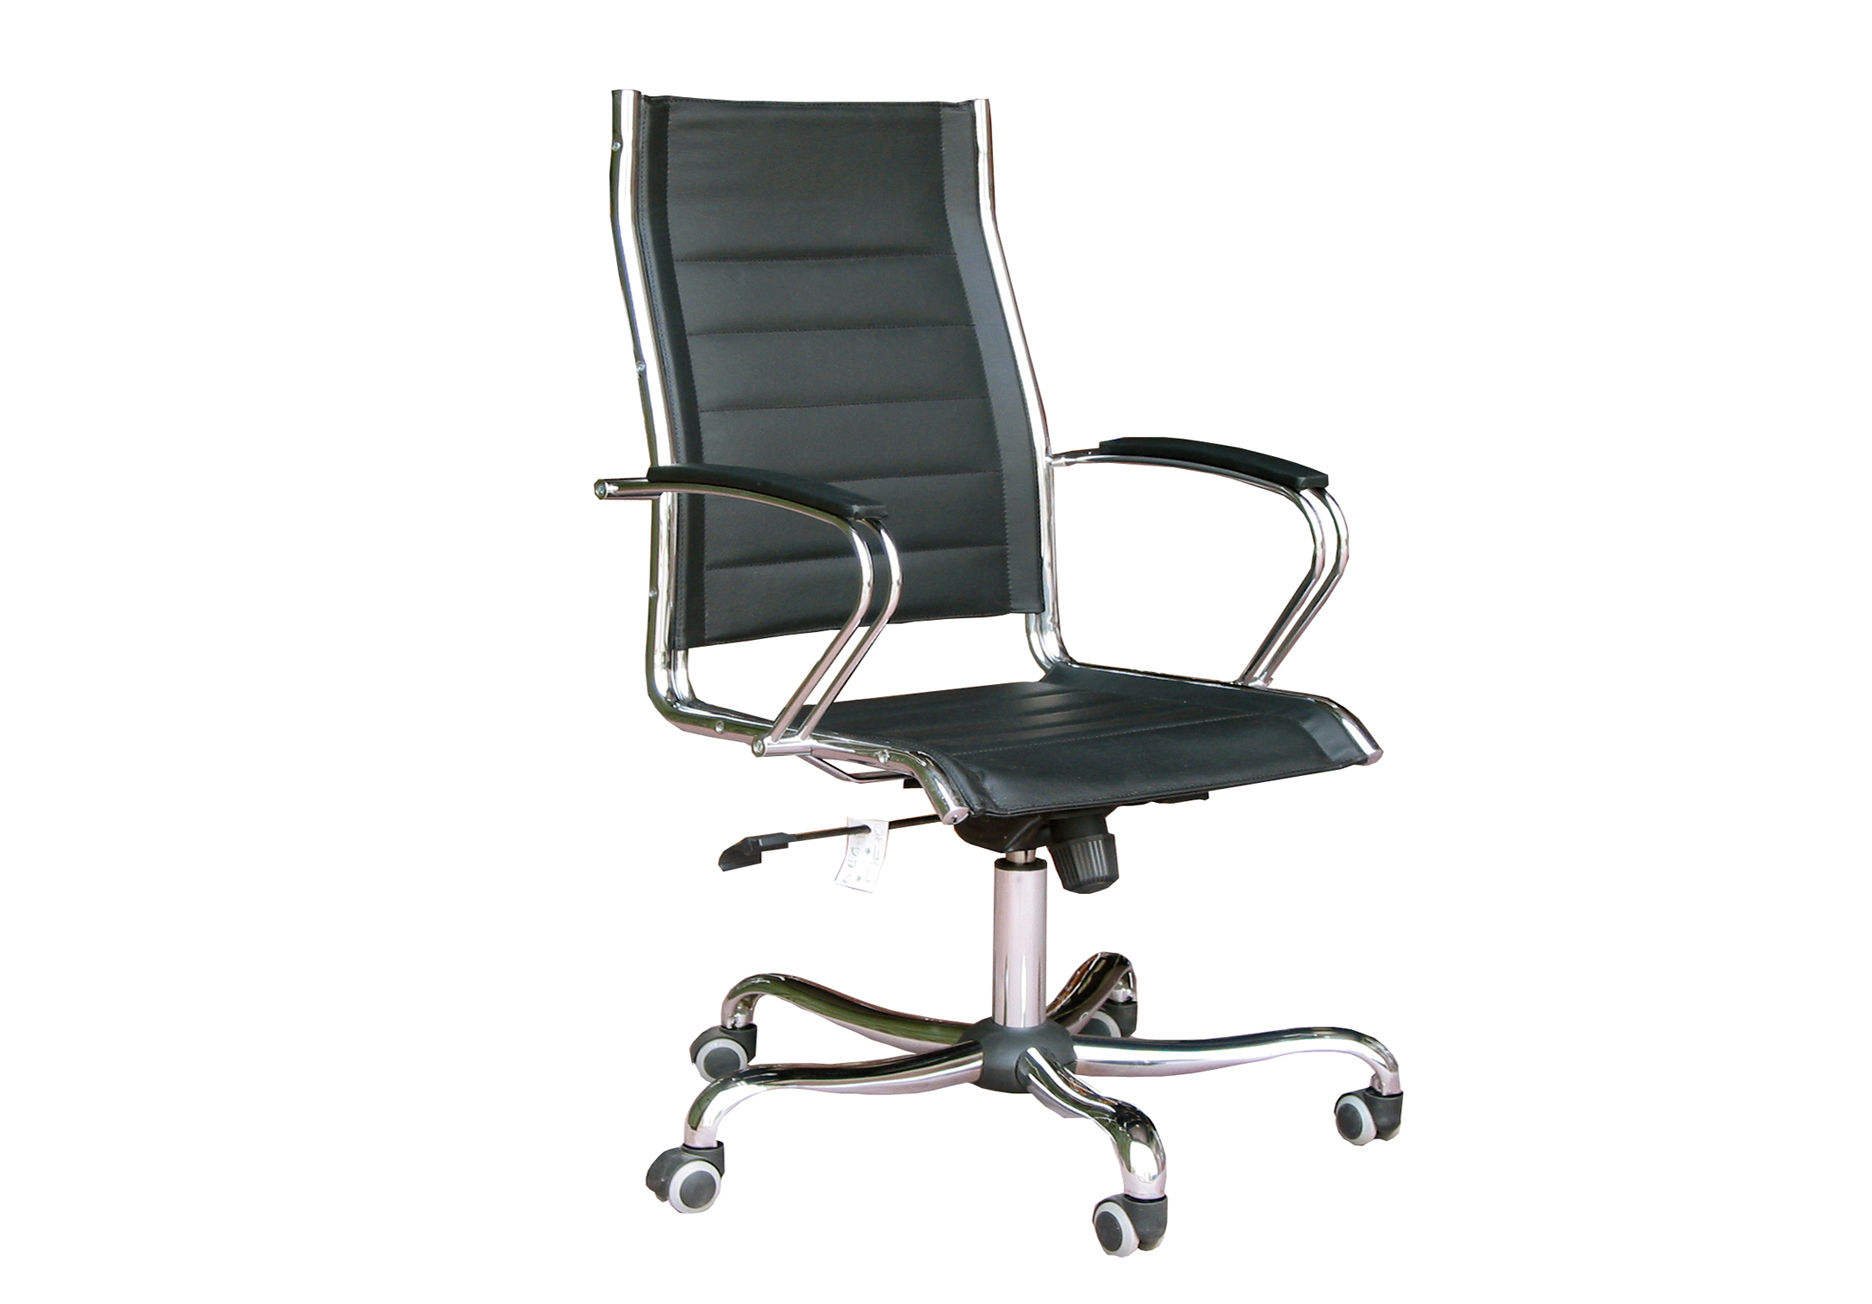 Sky line alquiler de mobiliario de stuhl ib rica for Alquiler de mobiliario de oficina